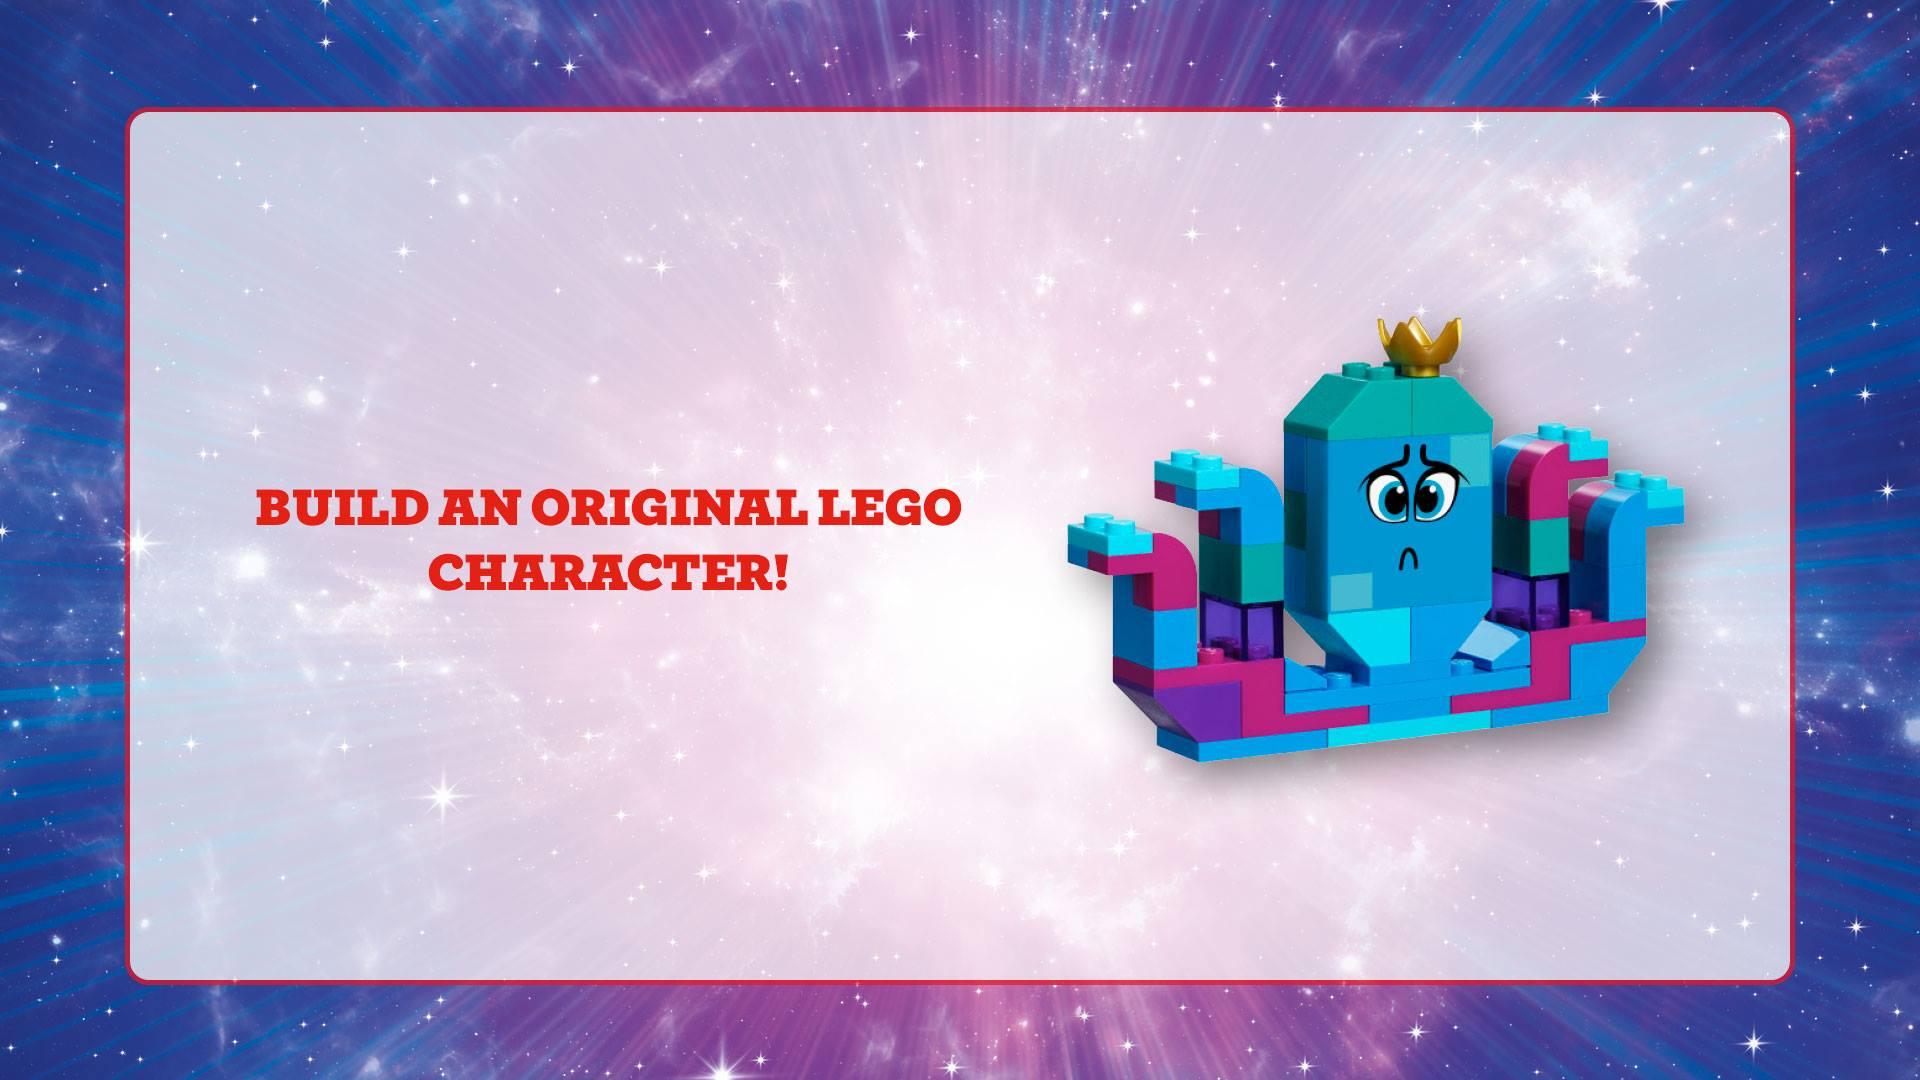 build an original lego character